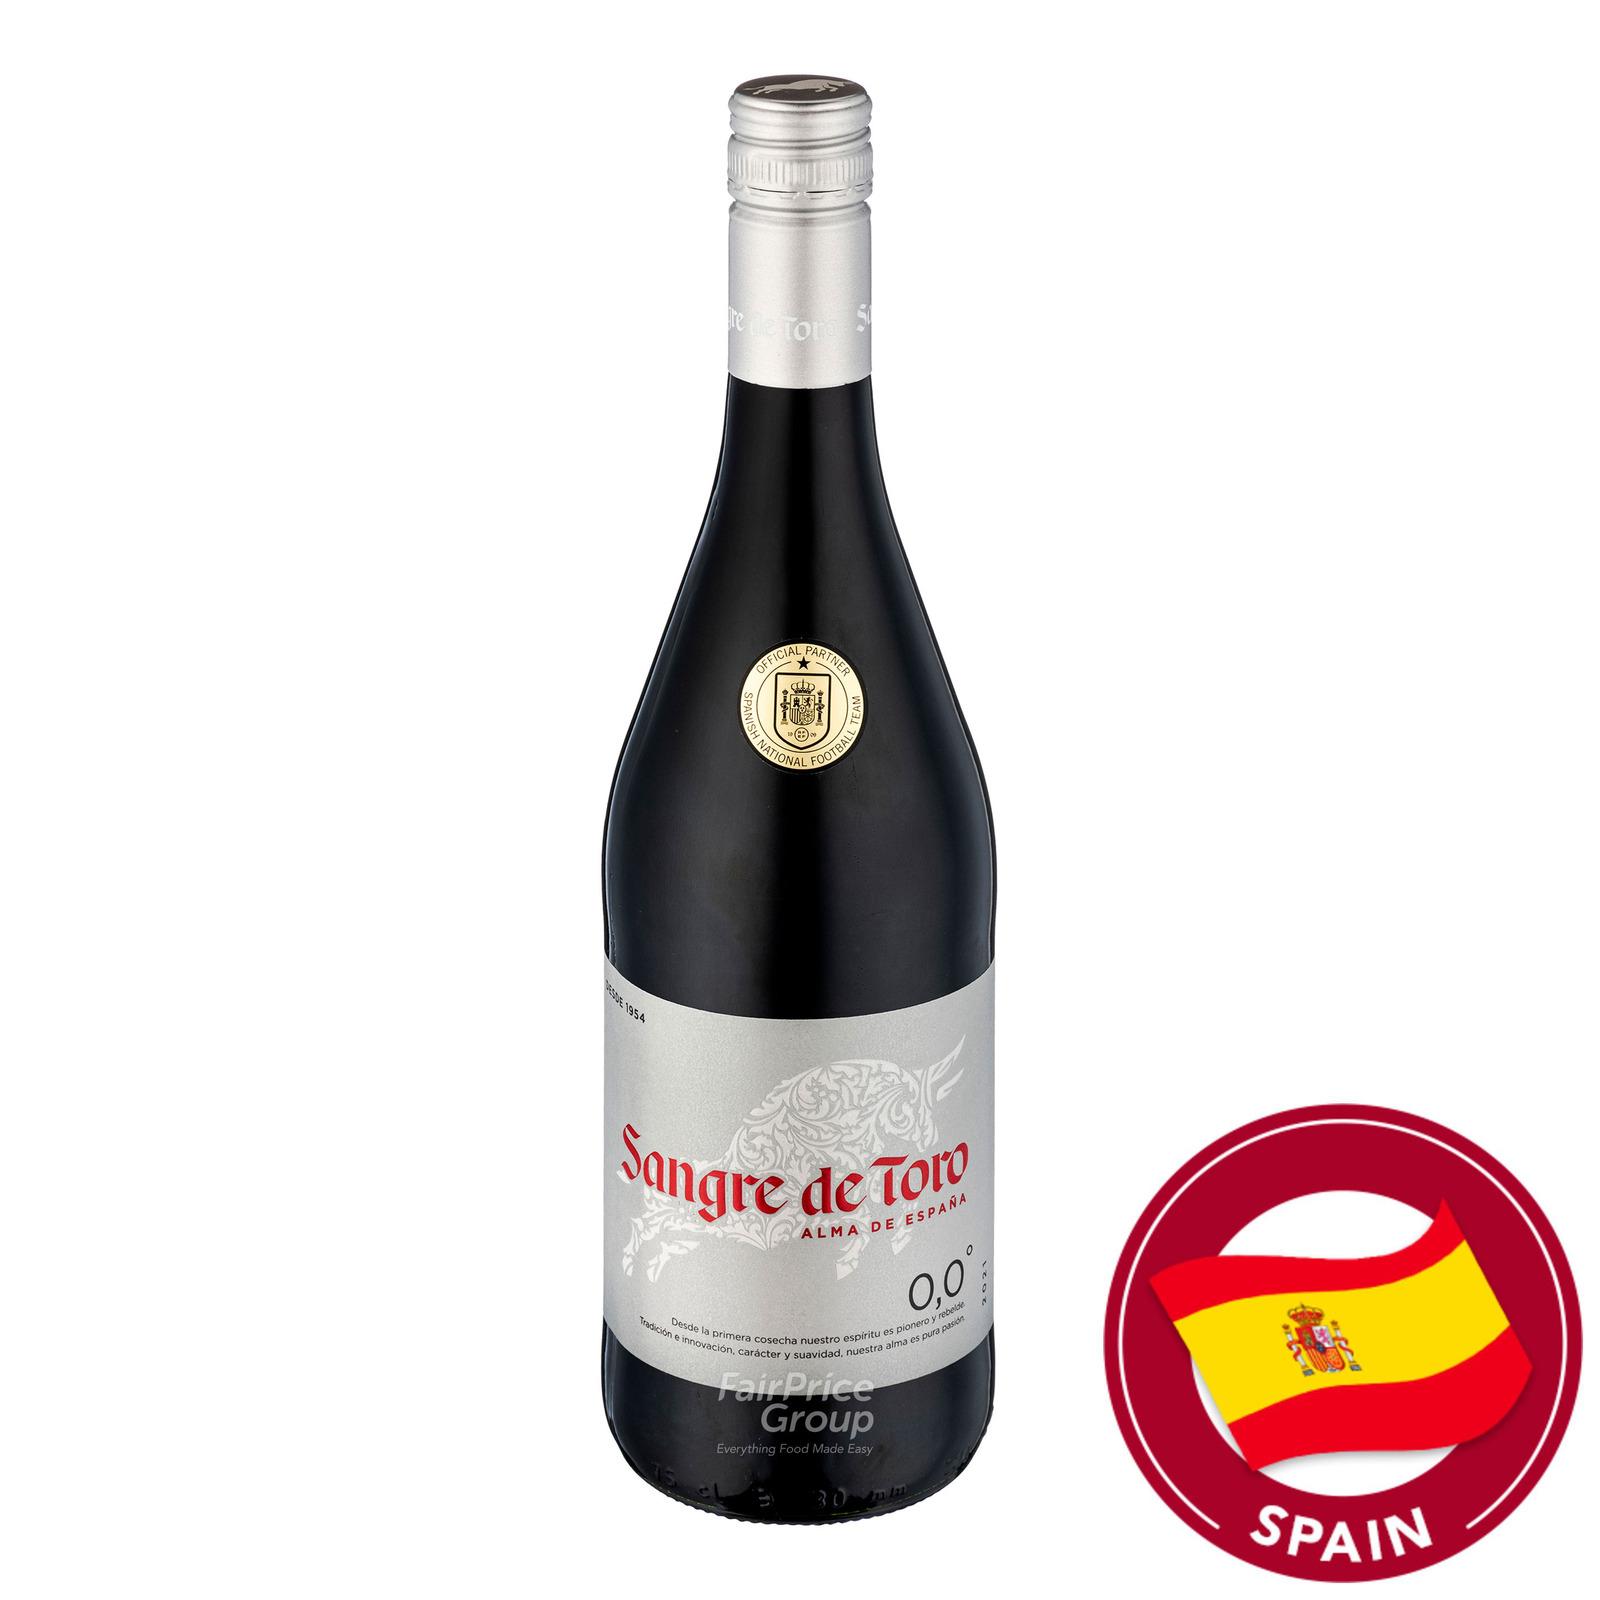 Sangre de Toro De-Alcoholised Red Wine